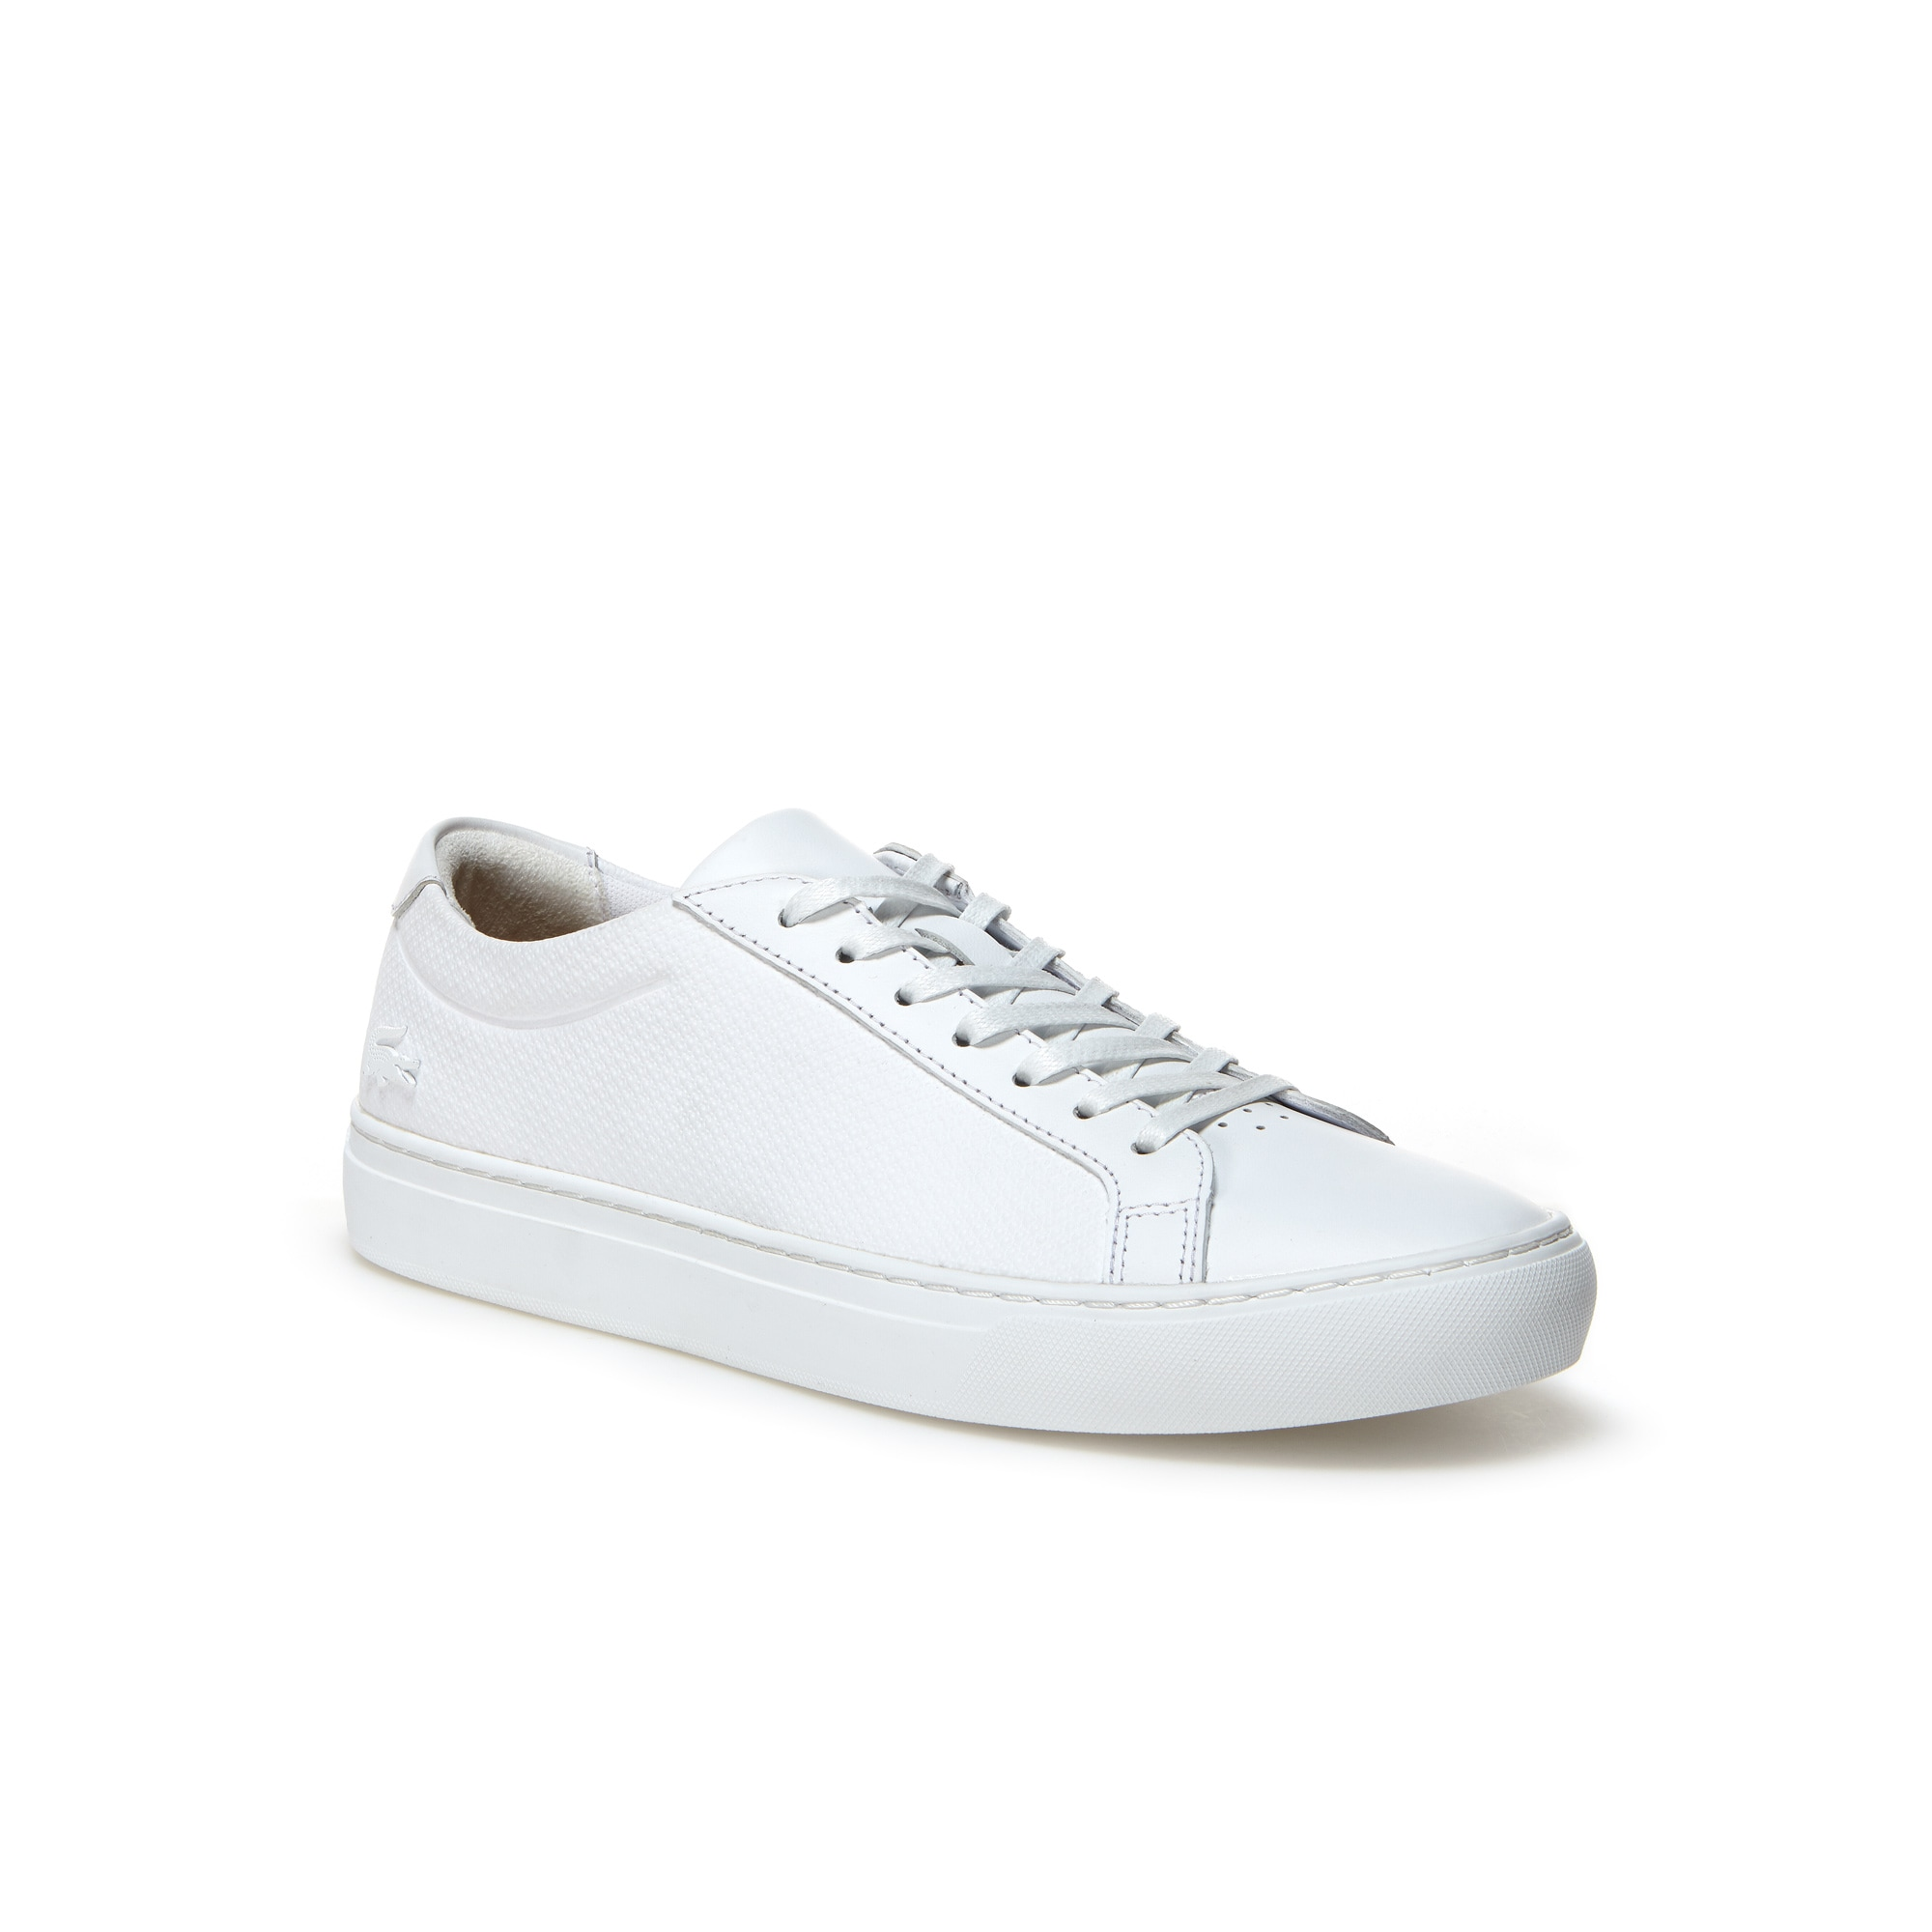 Herren-Sneakers L.12.12 aus Leder